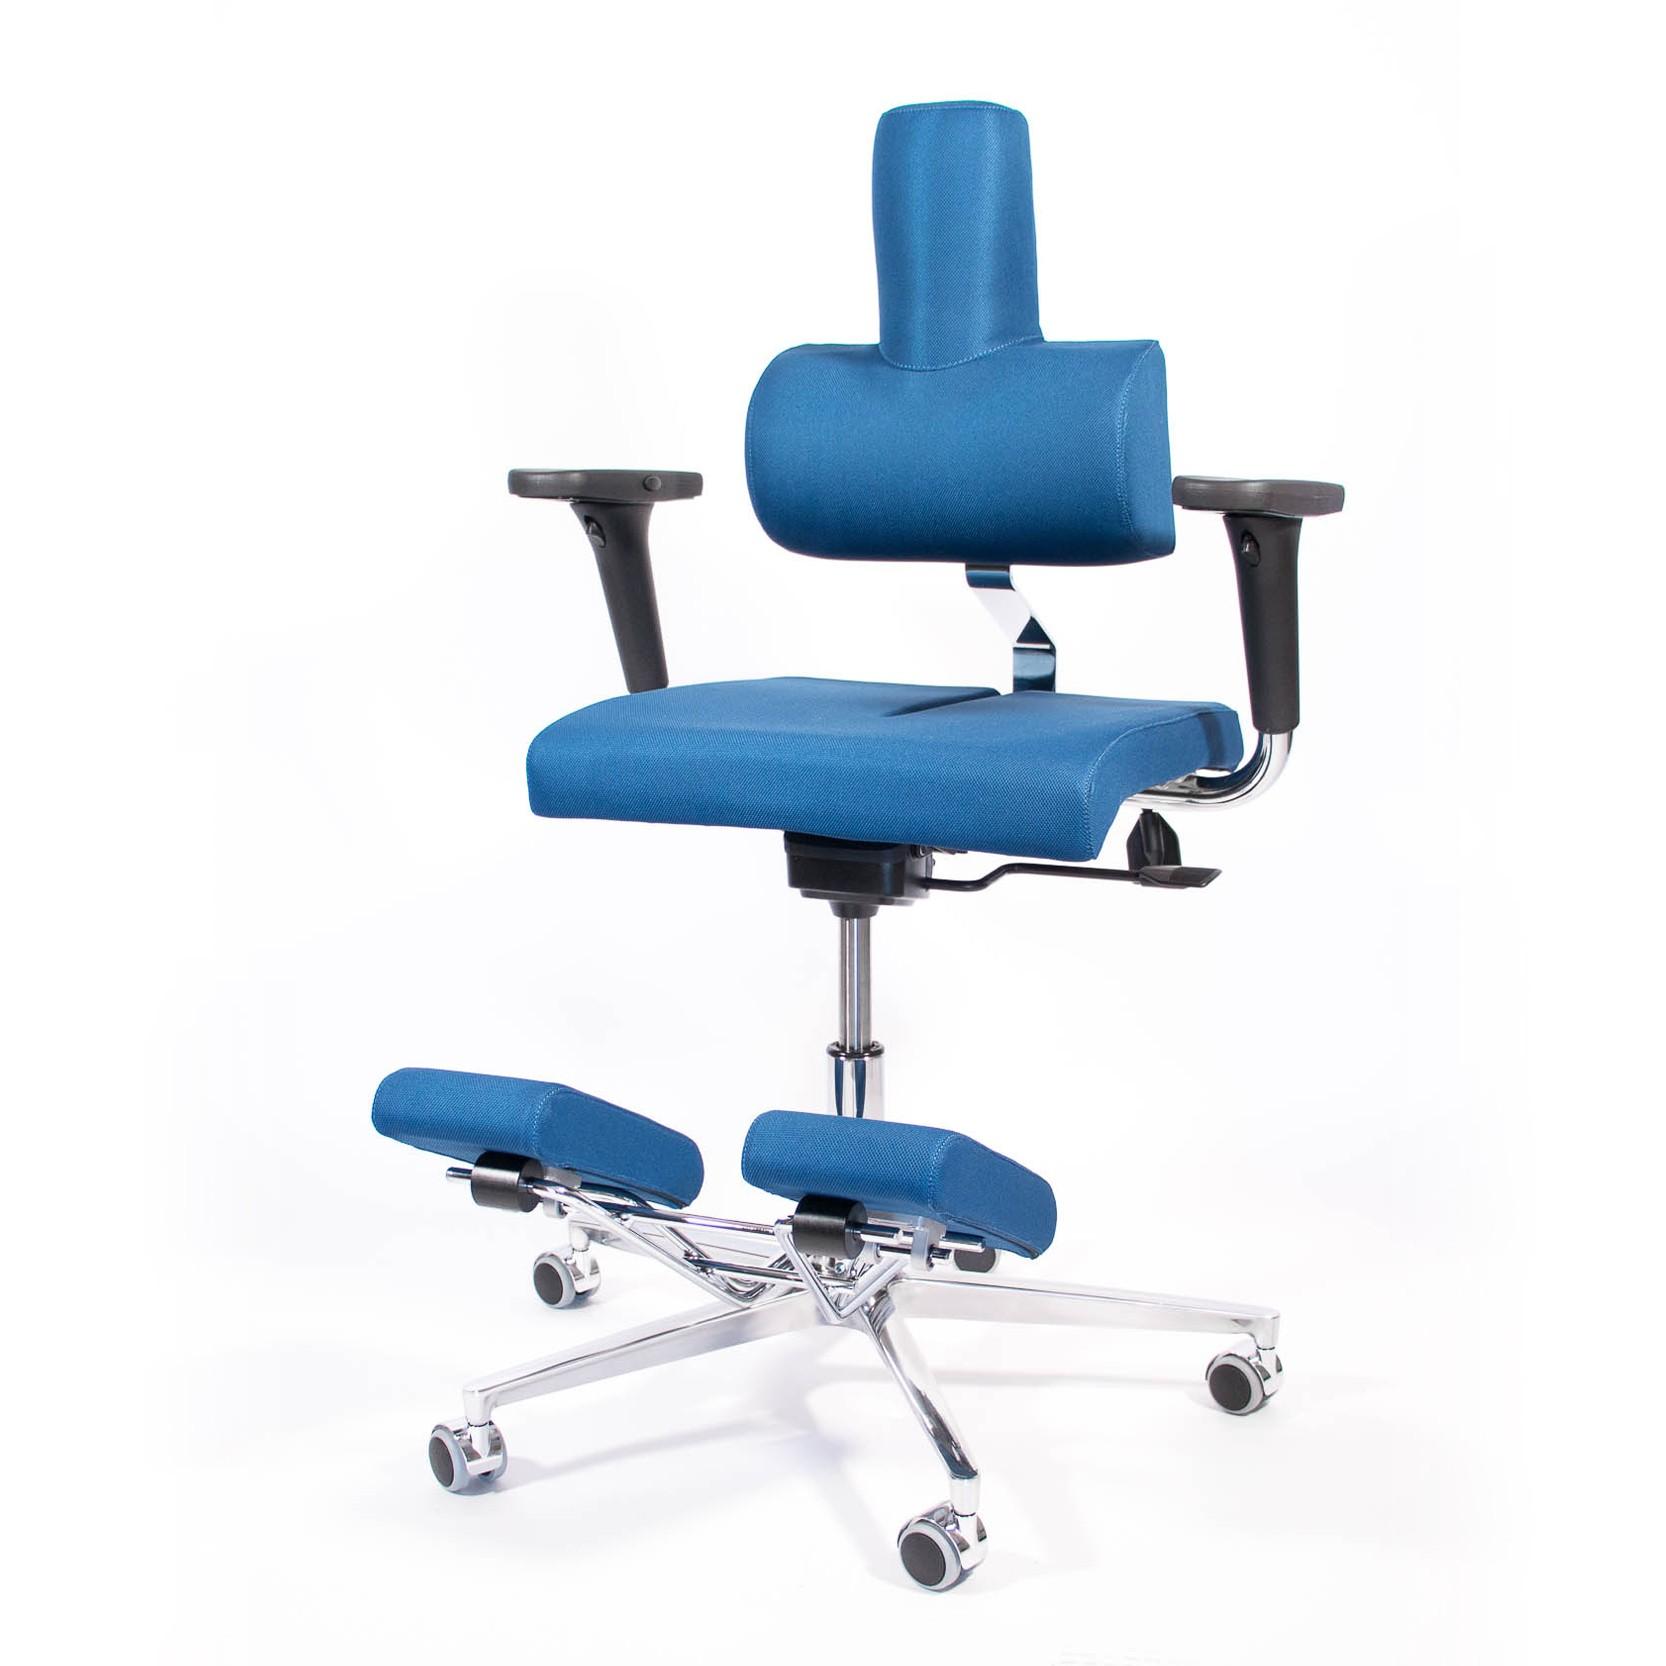 komfort spine ergonomic chair